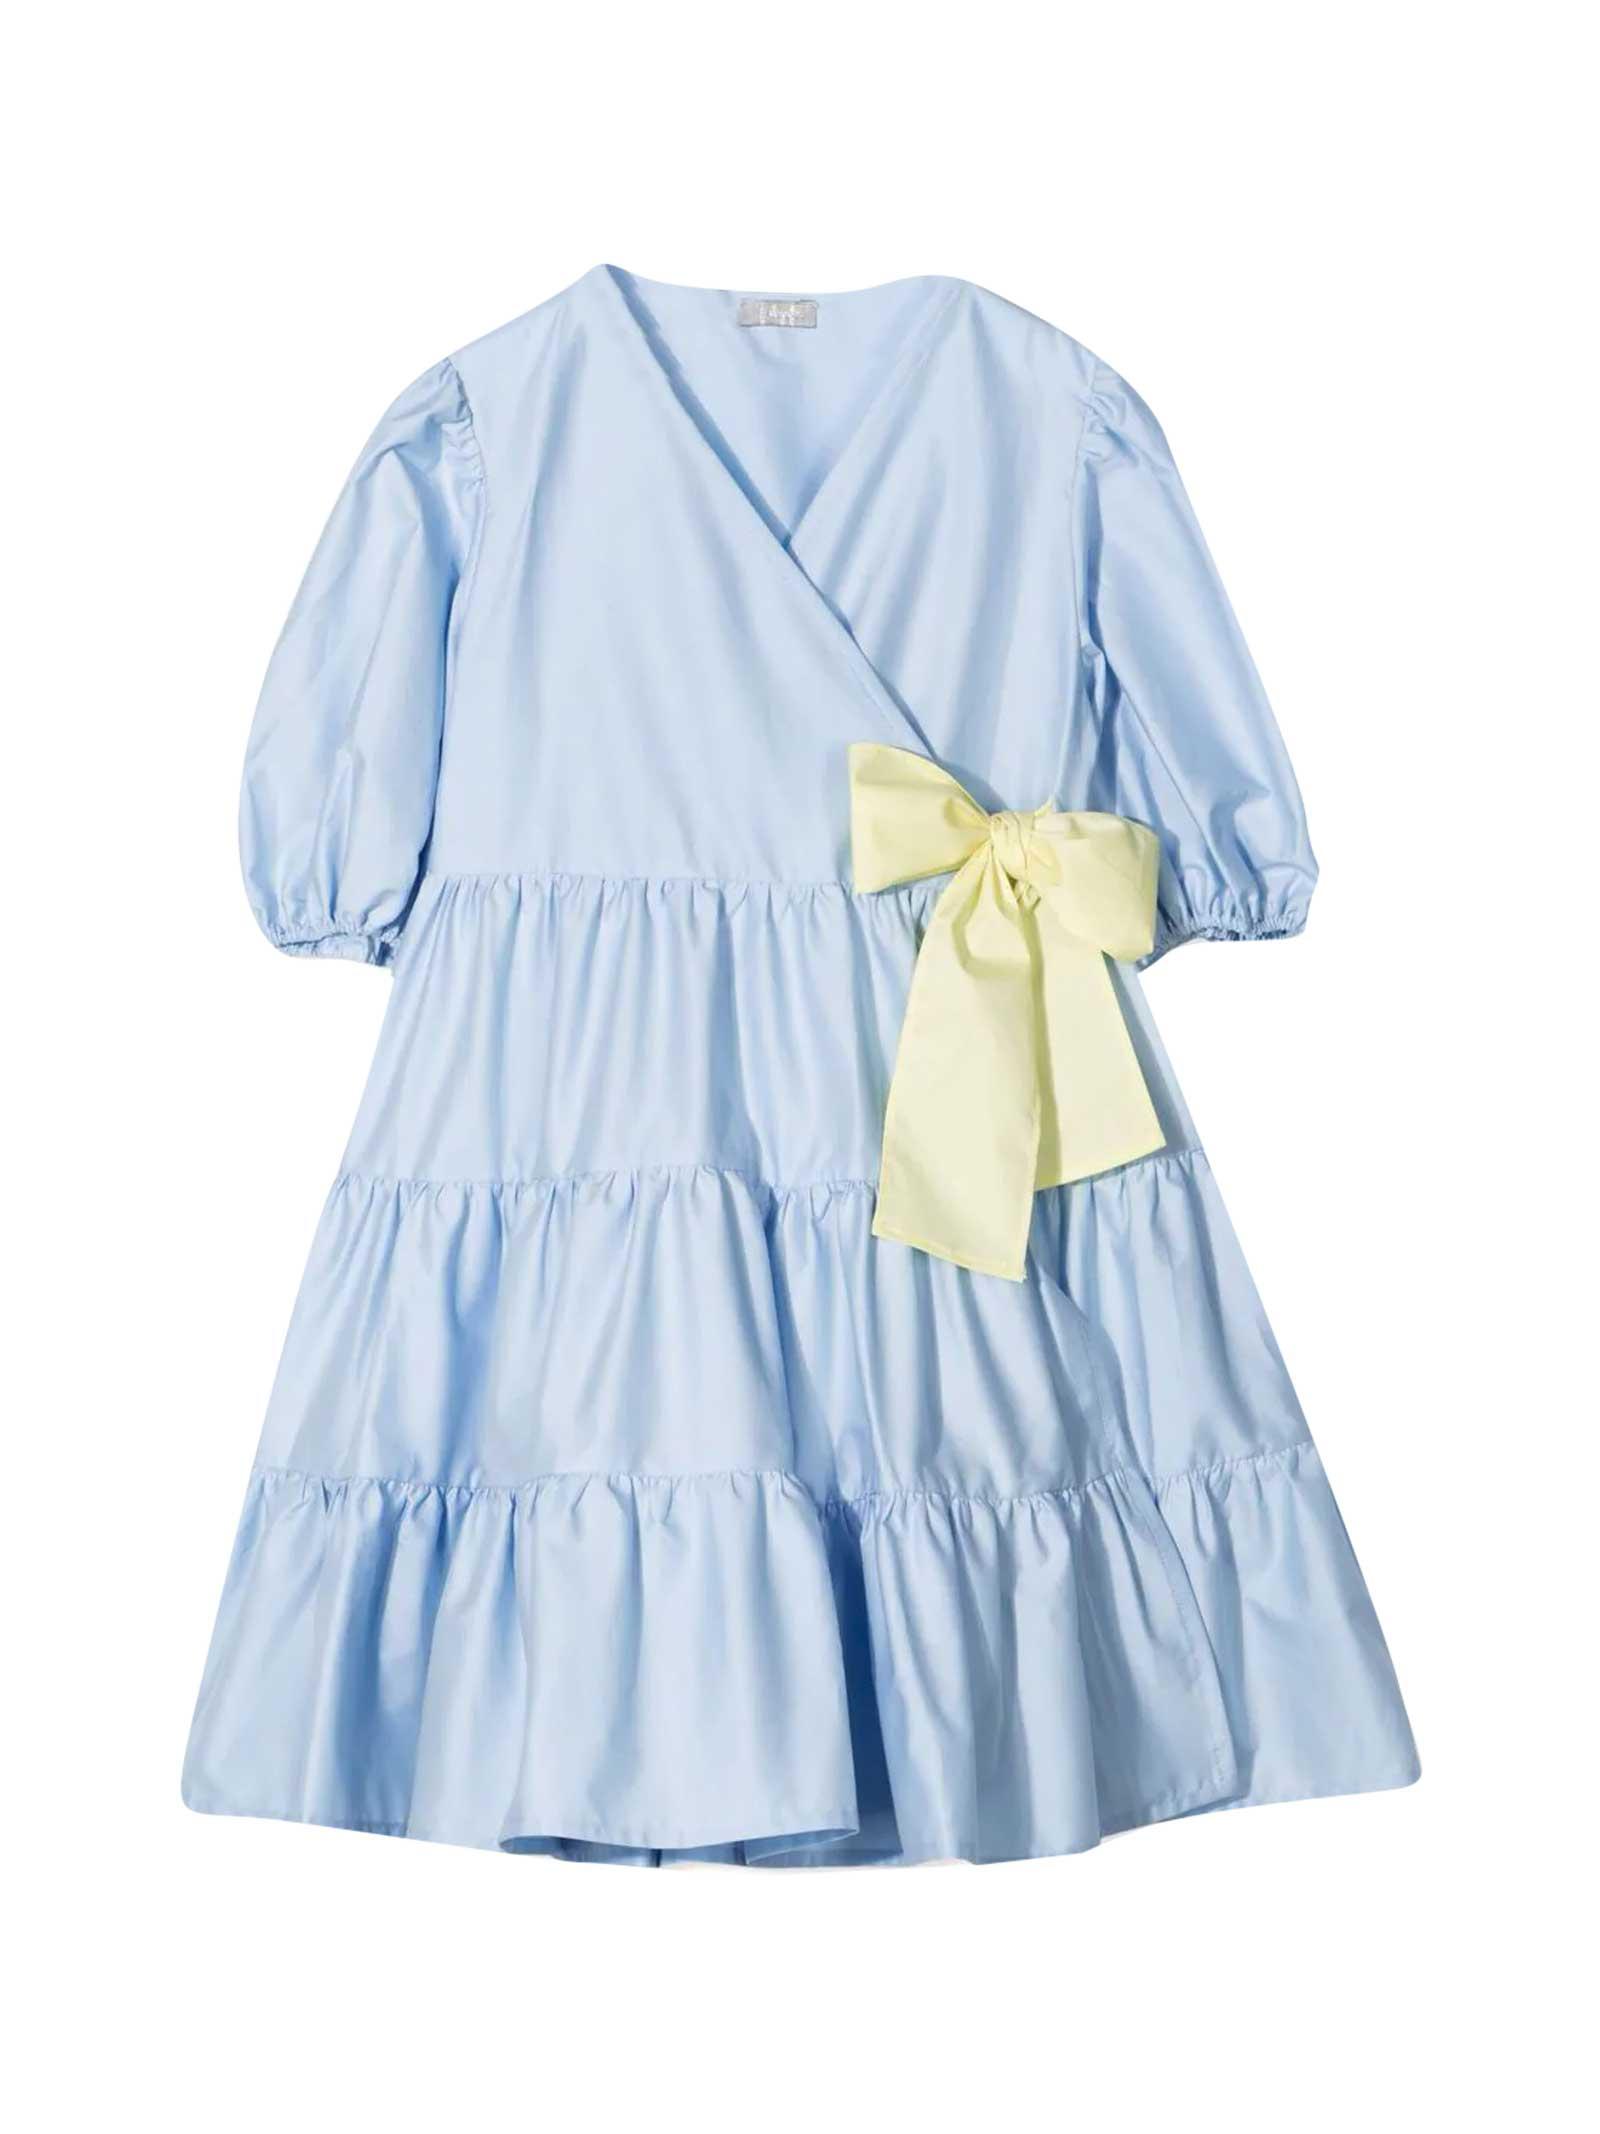 Dress With Horizontal Seams